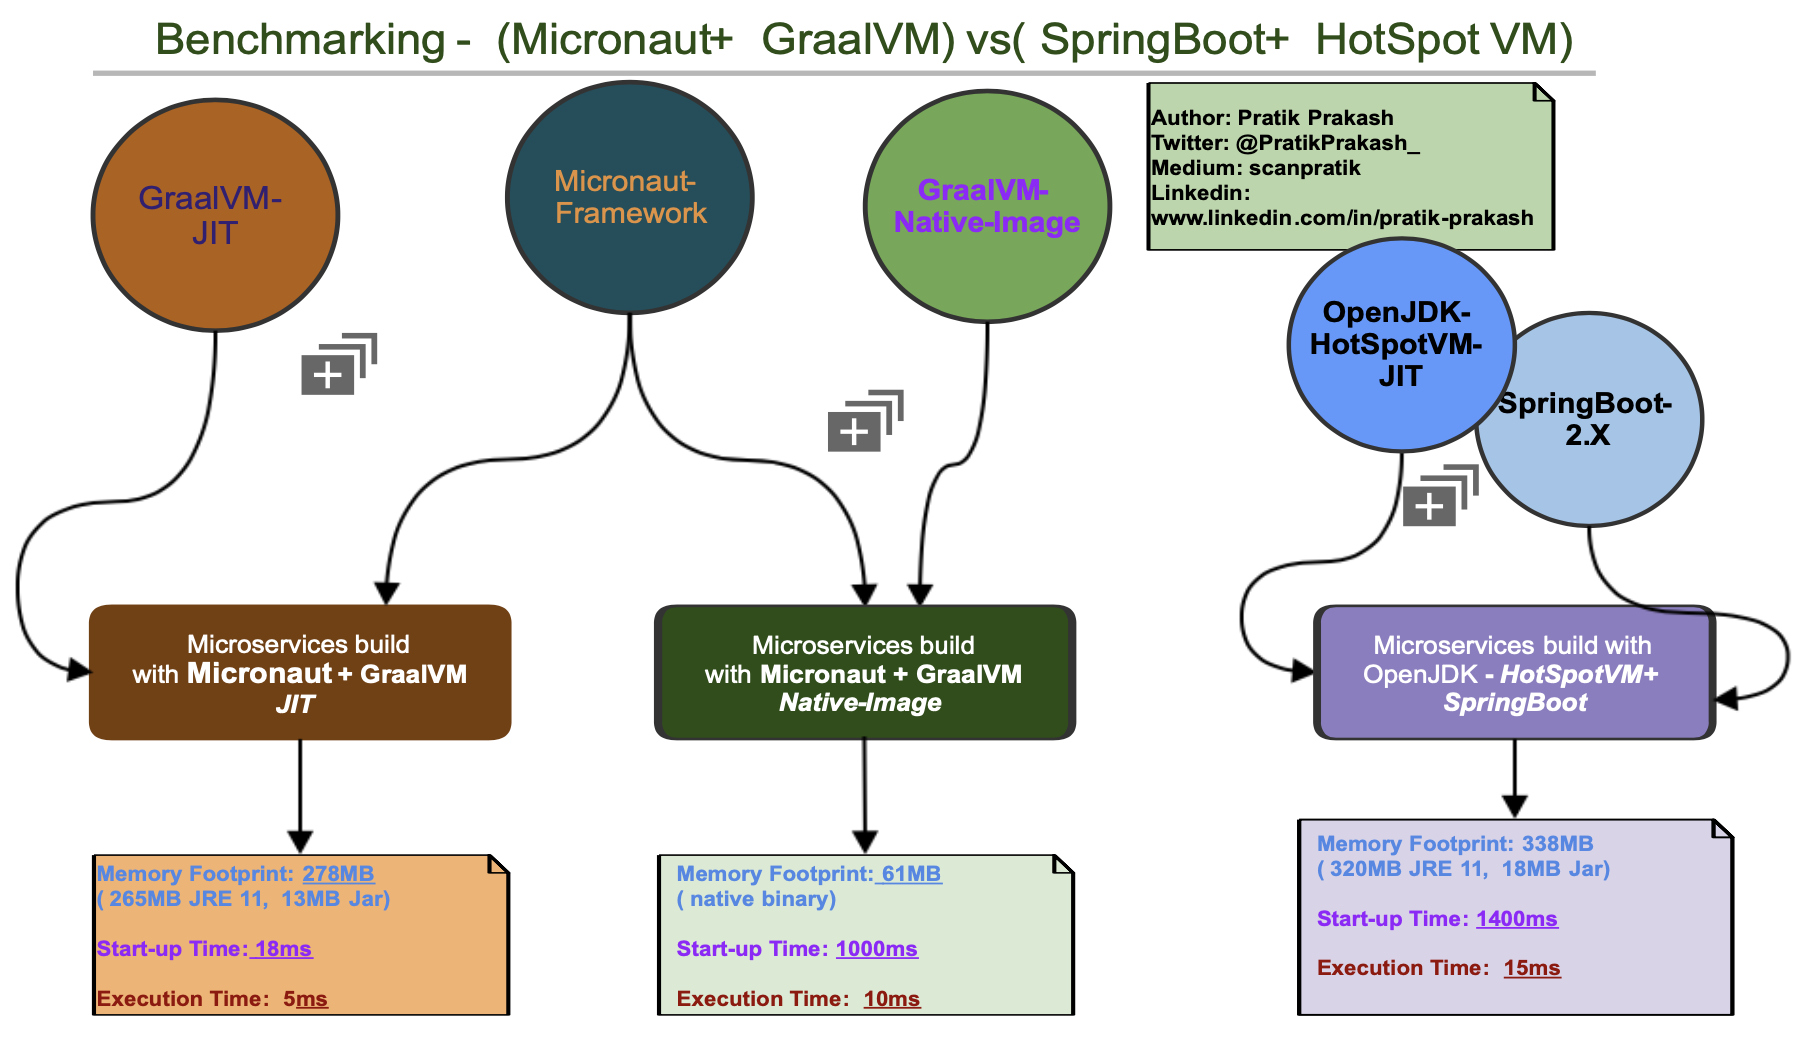 Benchmarking Micronaut